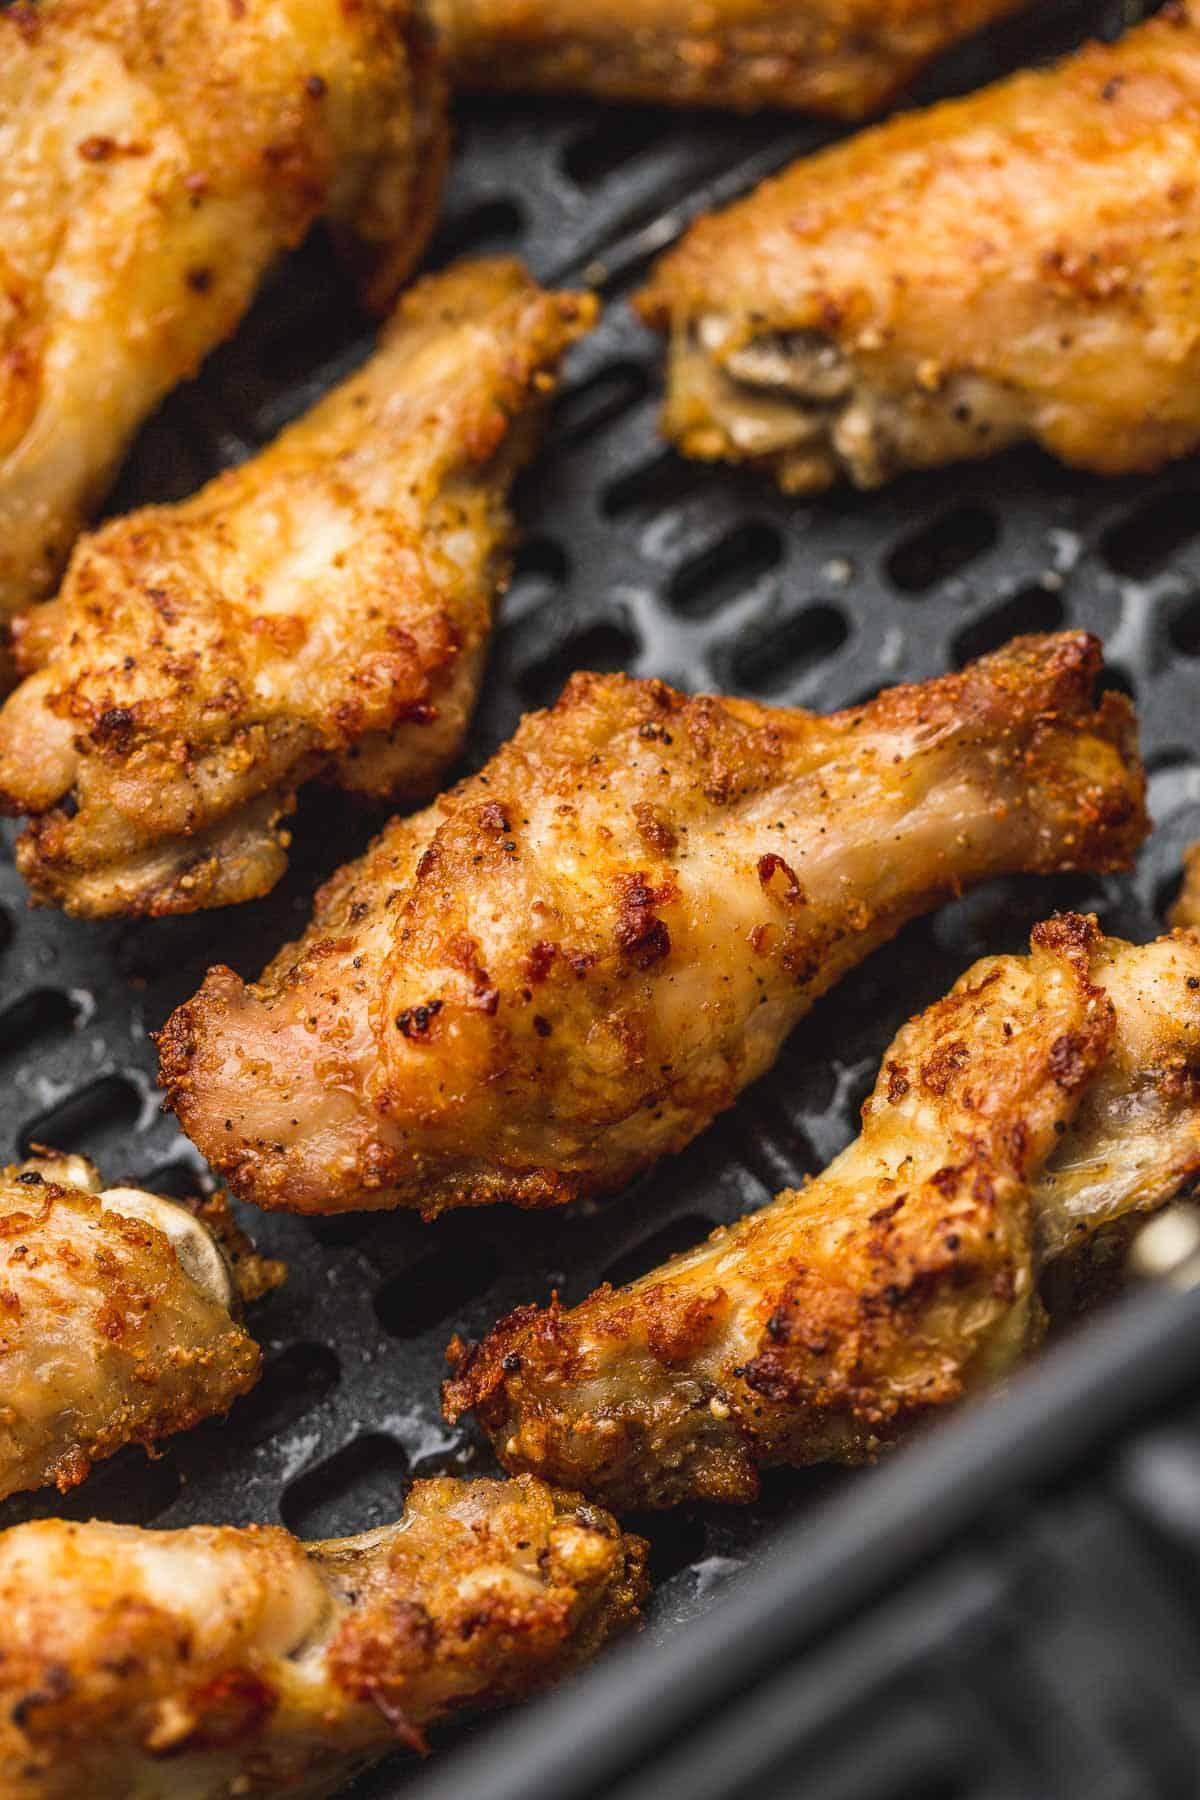 Crispy chicken wings spaced evenly on Air Fryer basket